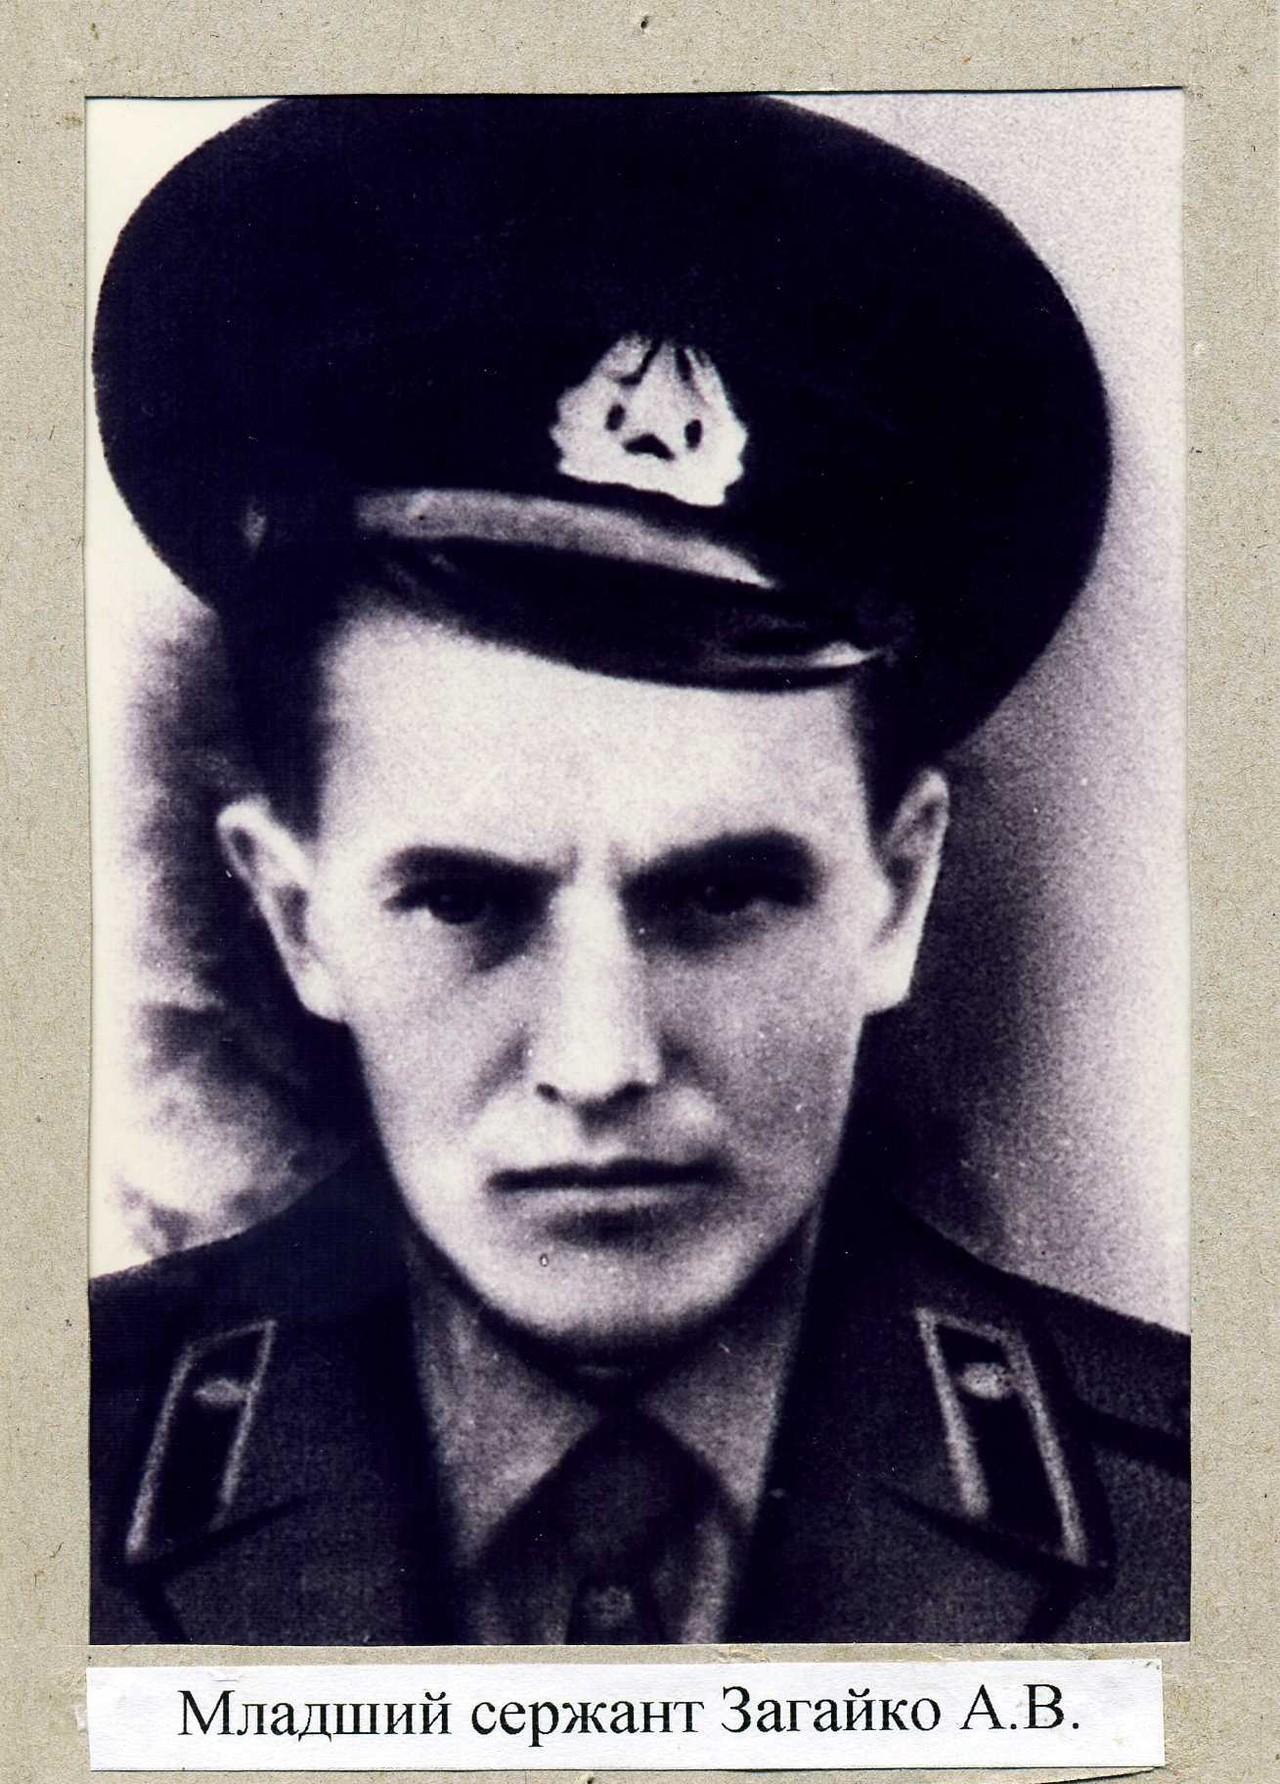 Загайко Анатолий Владимирович